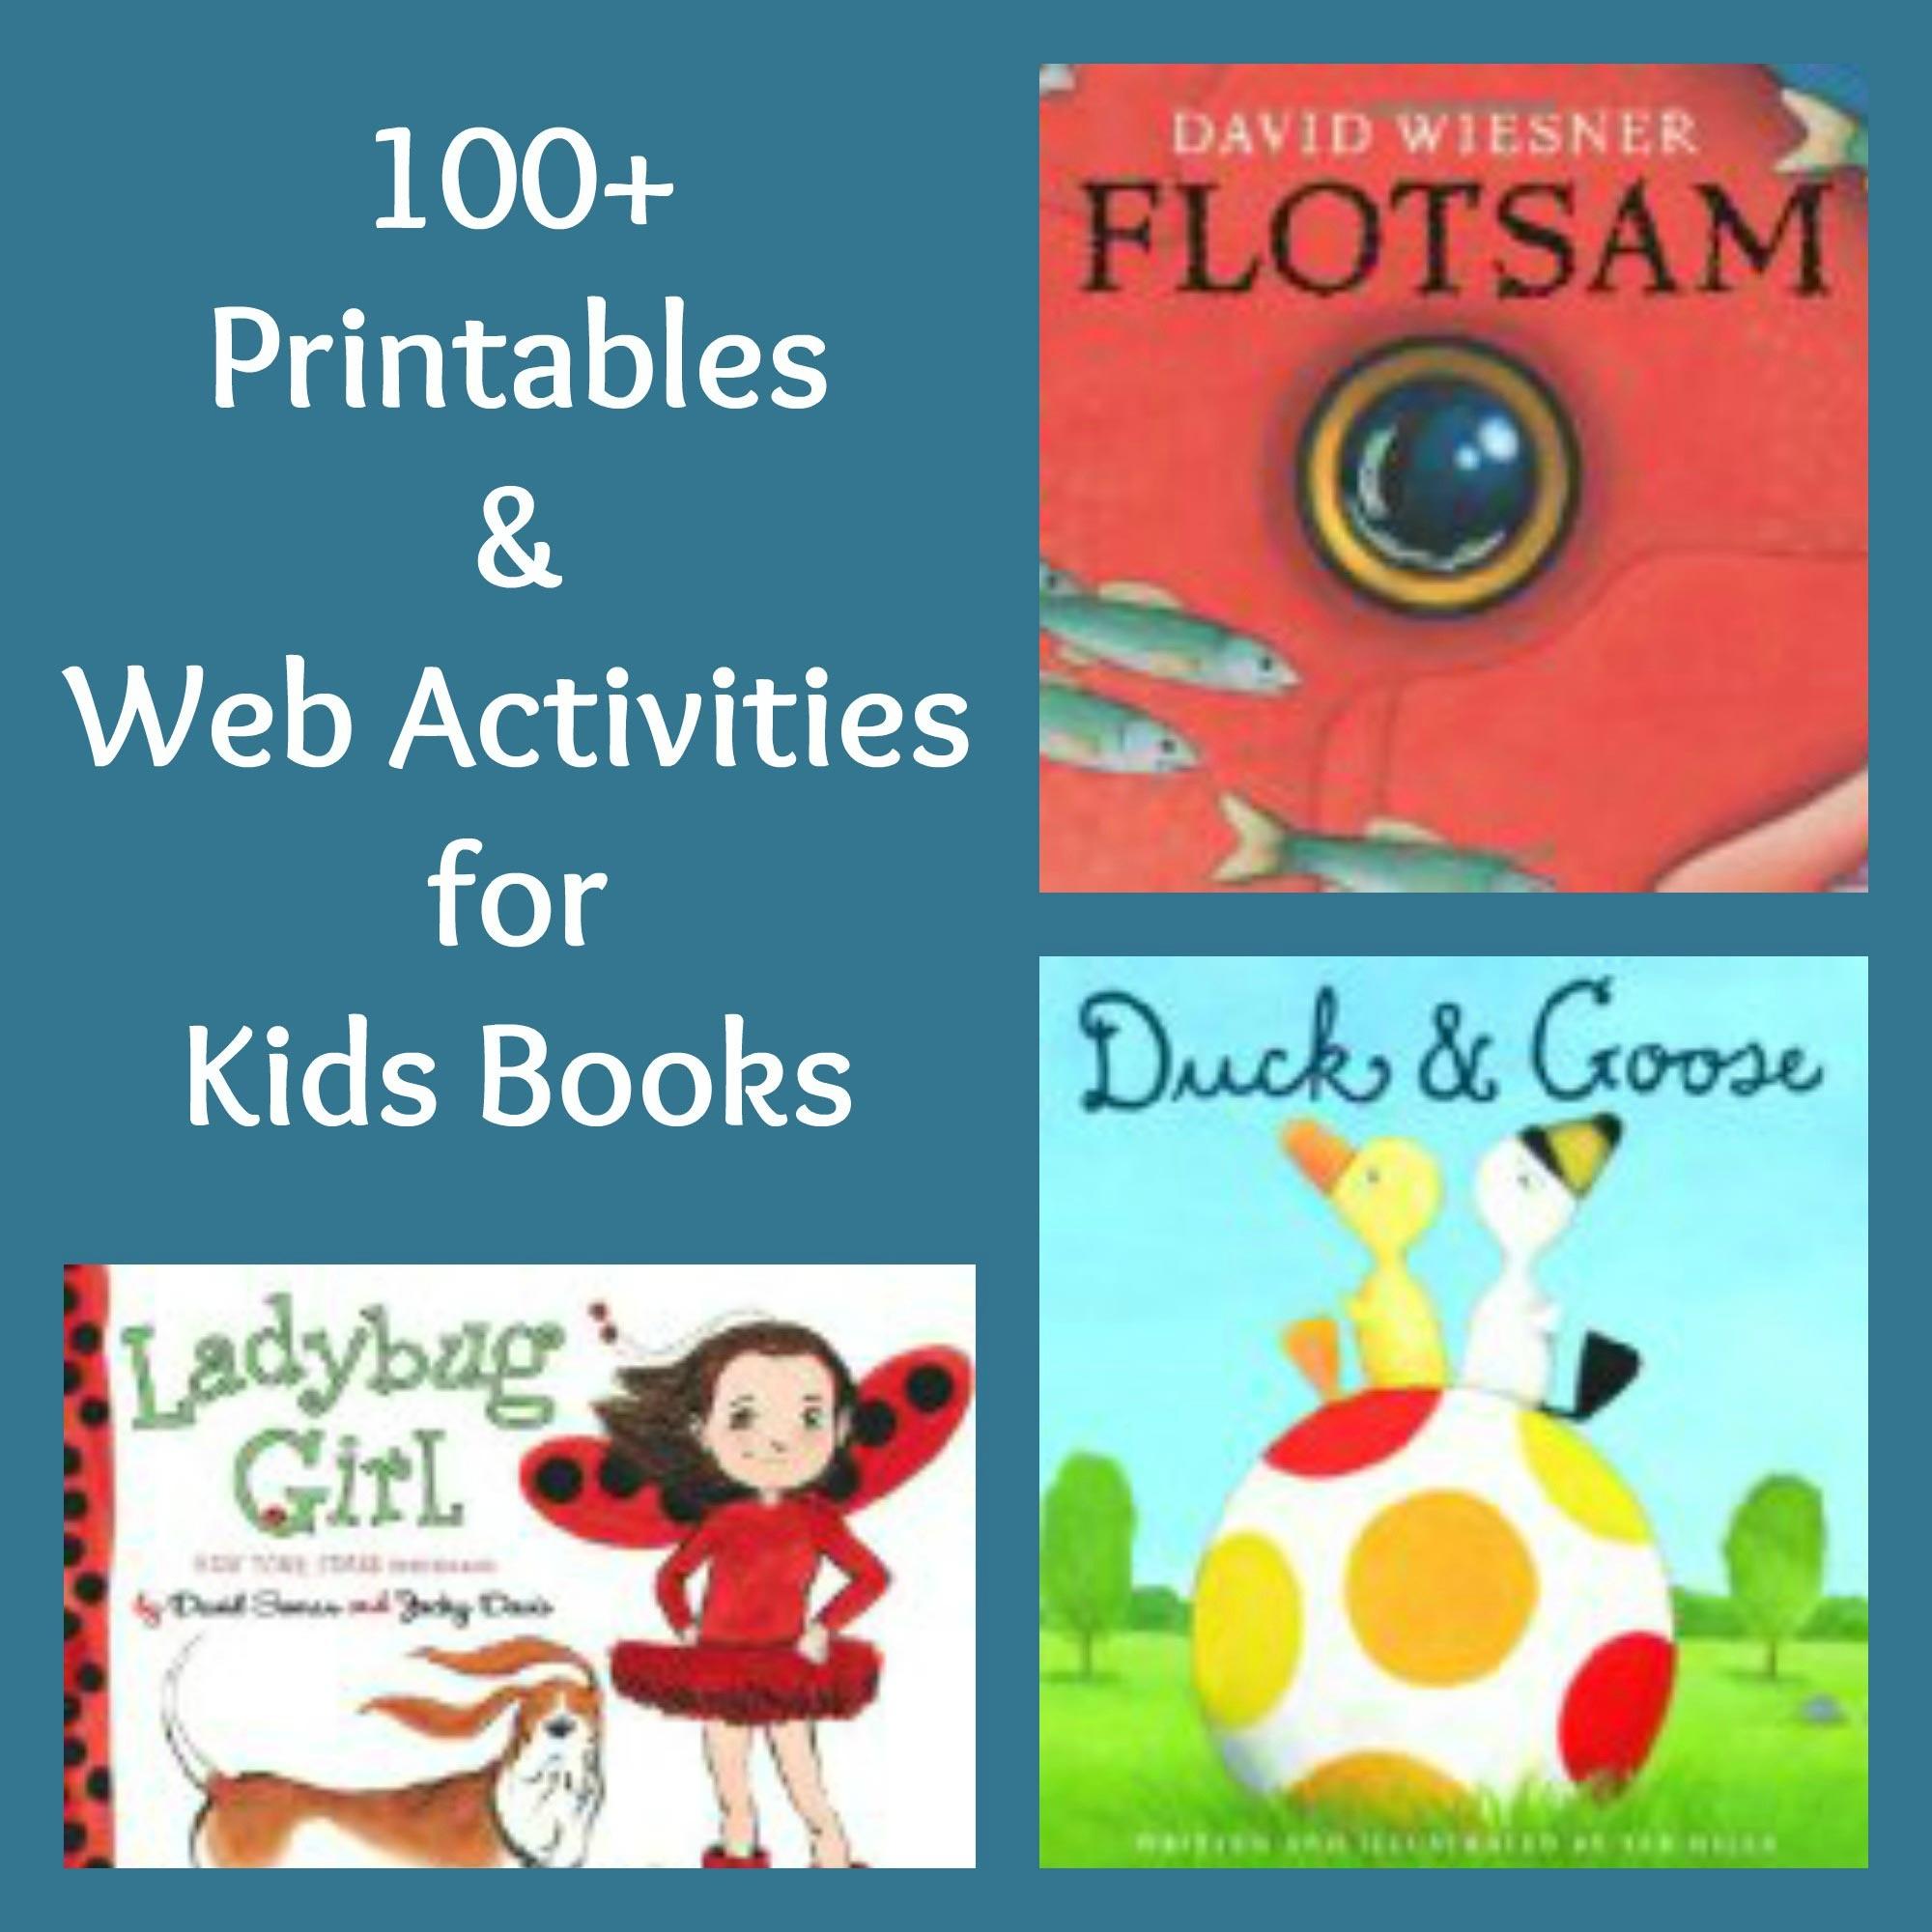 50+ Free Read Aloud Books Online - Edventures With Kids - Free Printable Stories For Preschoolers